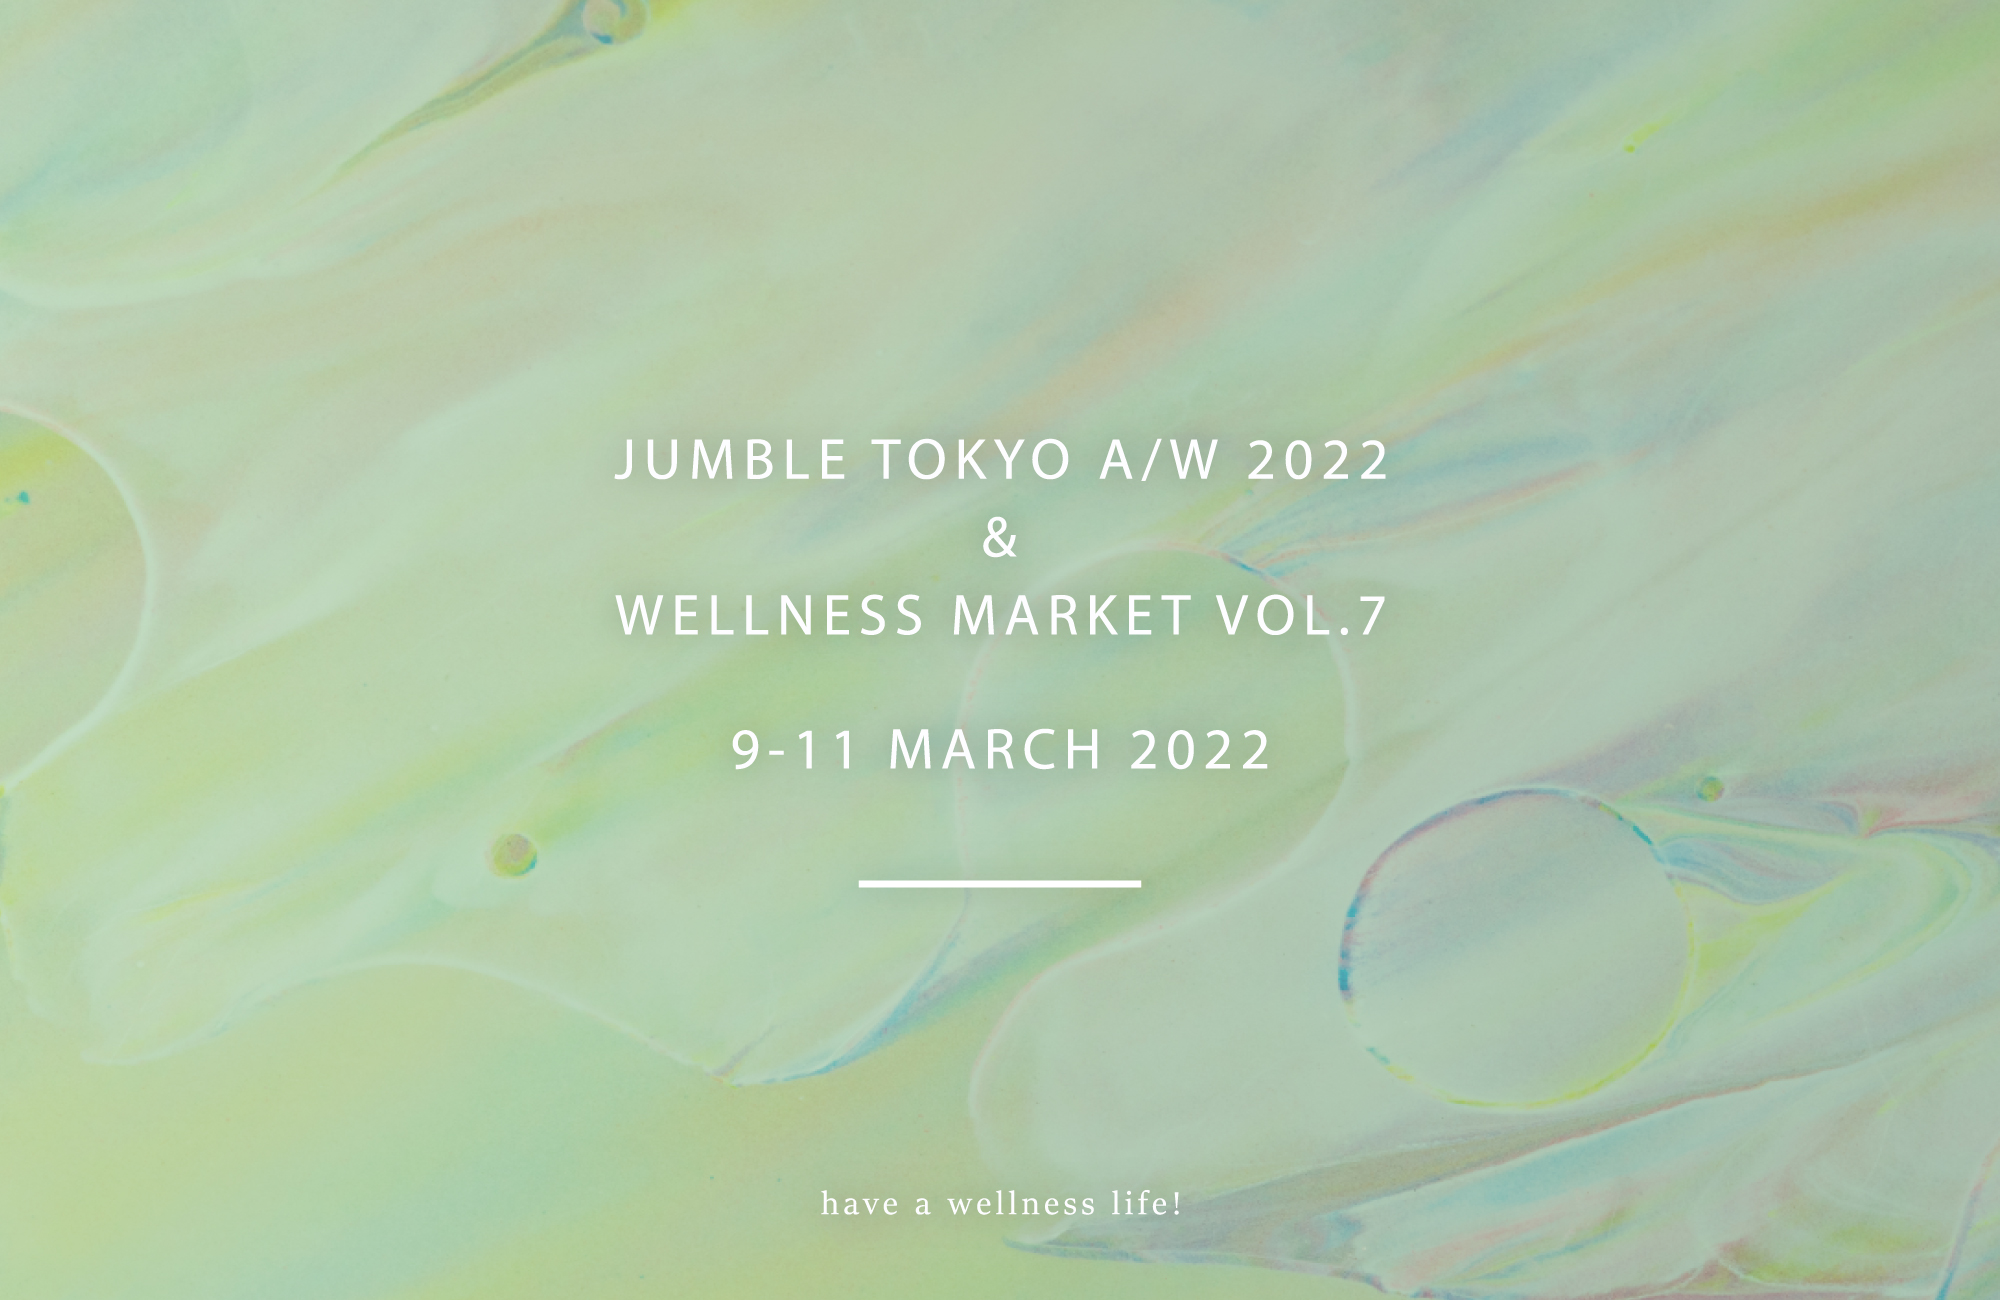 JUMBLE_22AW_banner